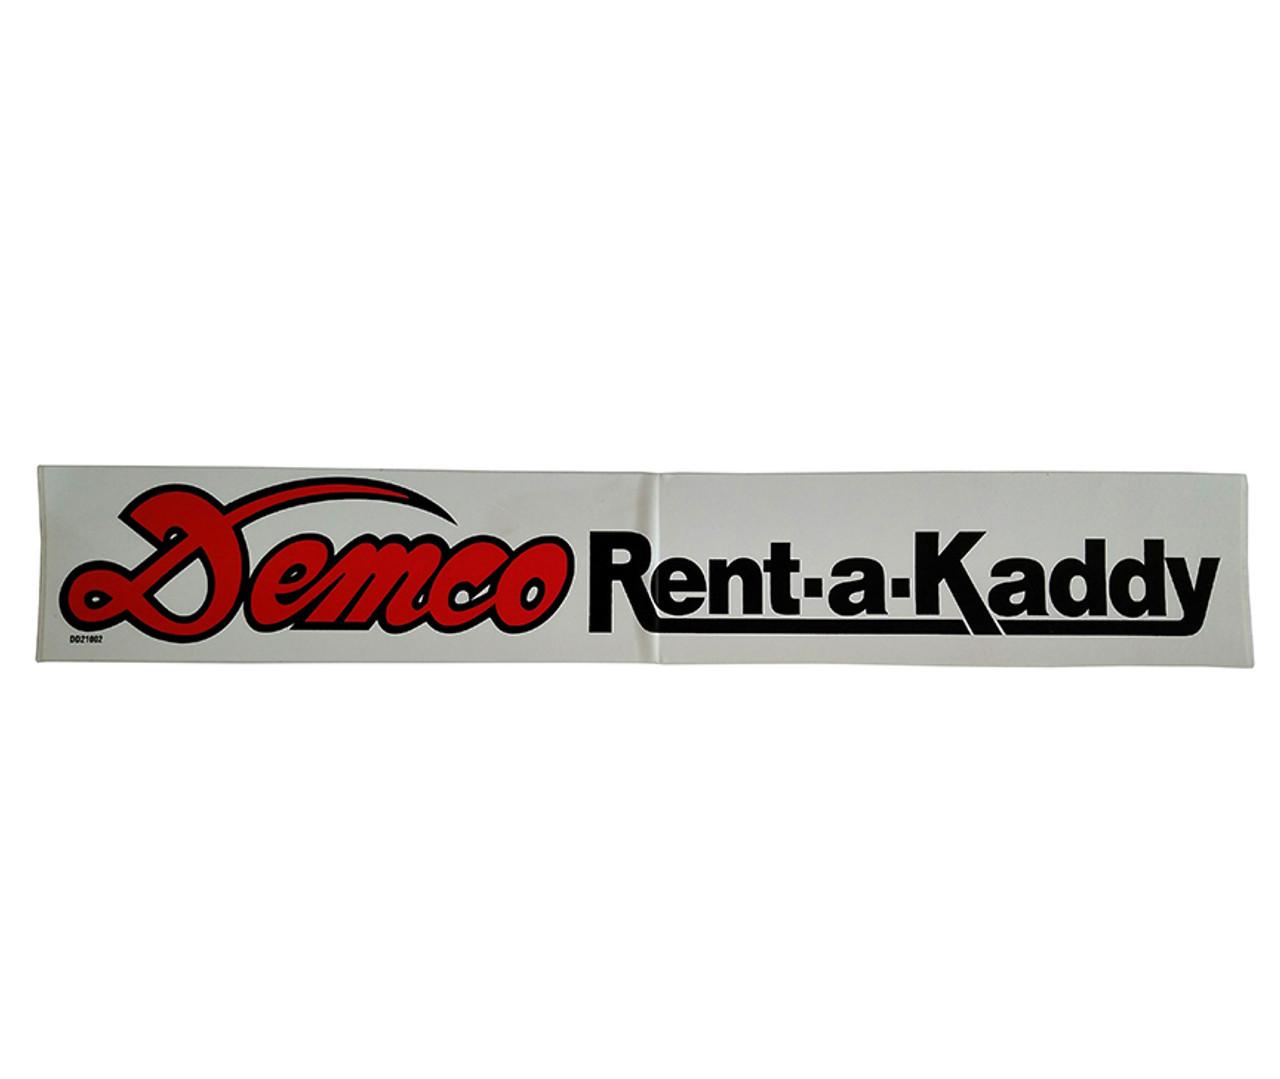 DD21002 --- Demco Rent-a-Kaddy Decal